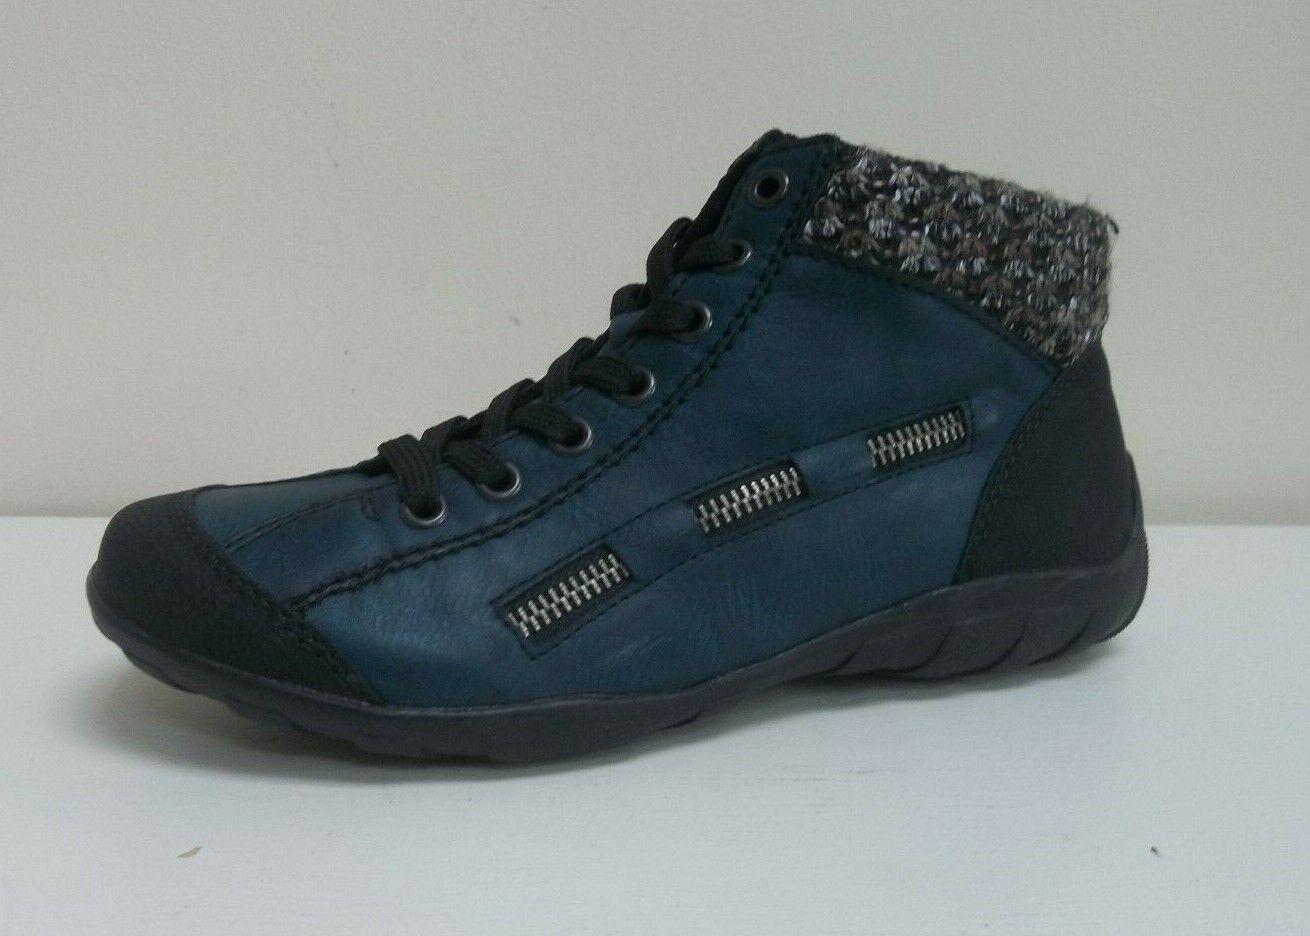 Rieker ladies turquoise lace-up schuhe, UK 3.5 EU 36.5, 36.5, 36.5, BNWB 22ce90